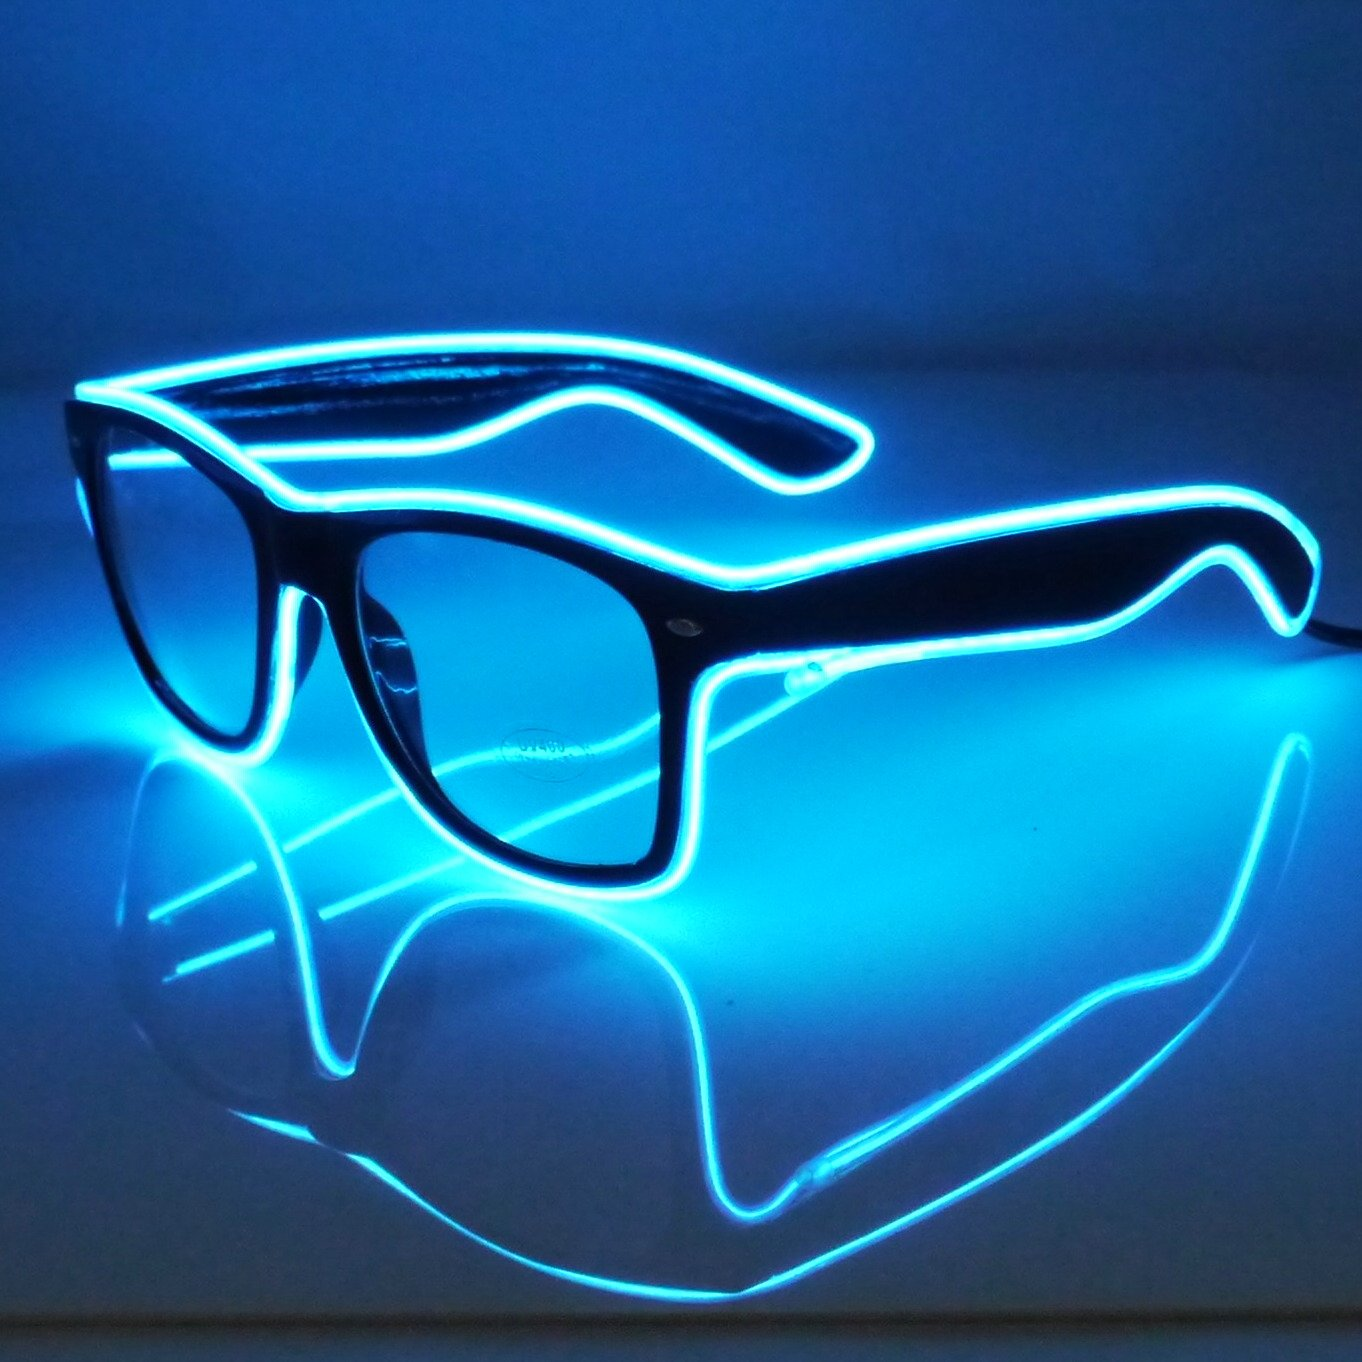 Amazon.com: Light Up El Wire Glasses (Blue): Toys & Games